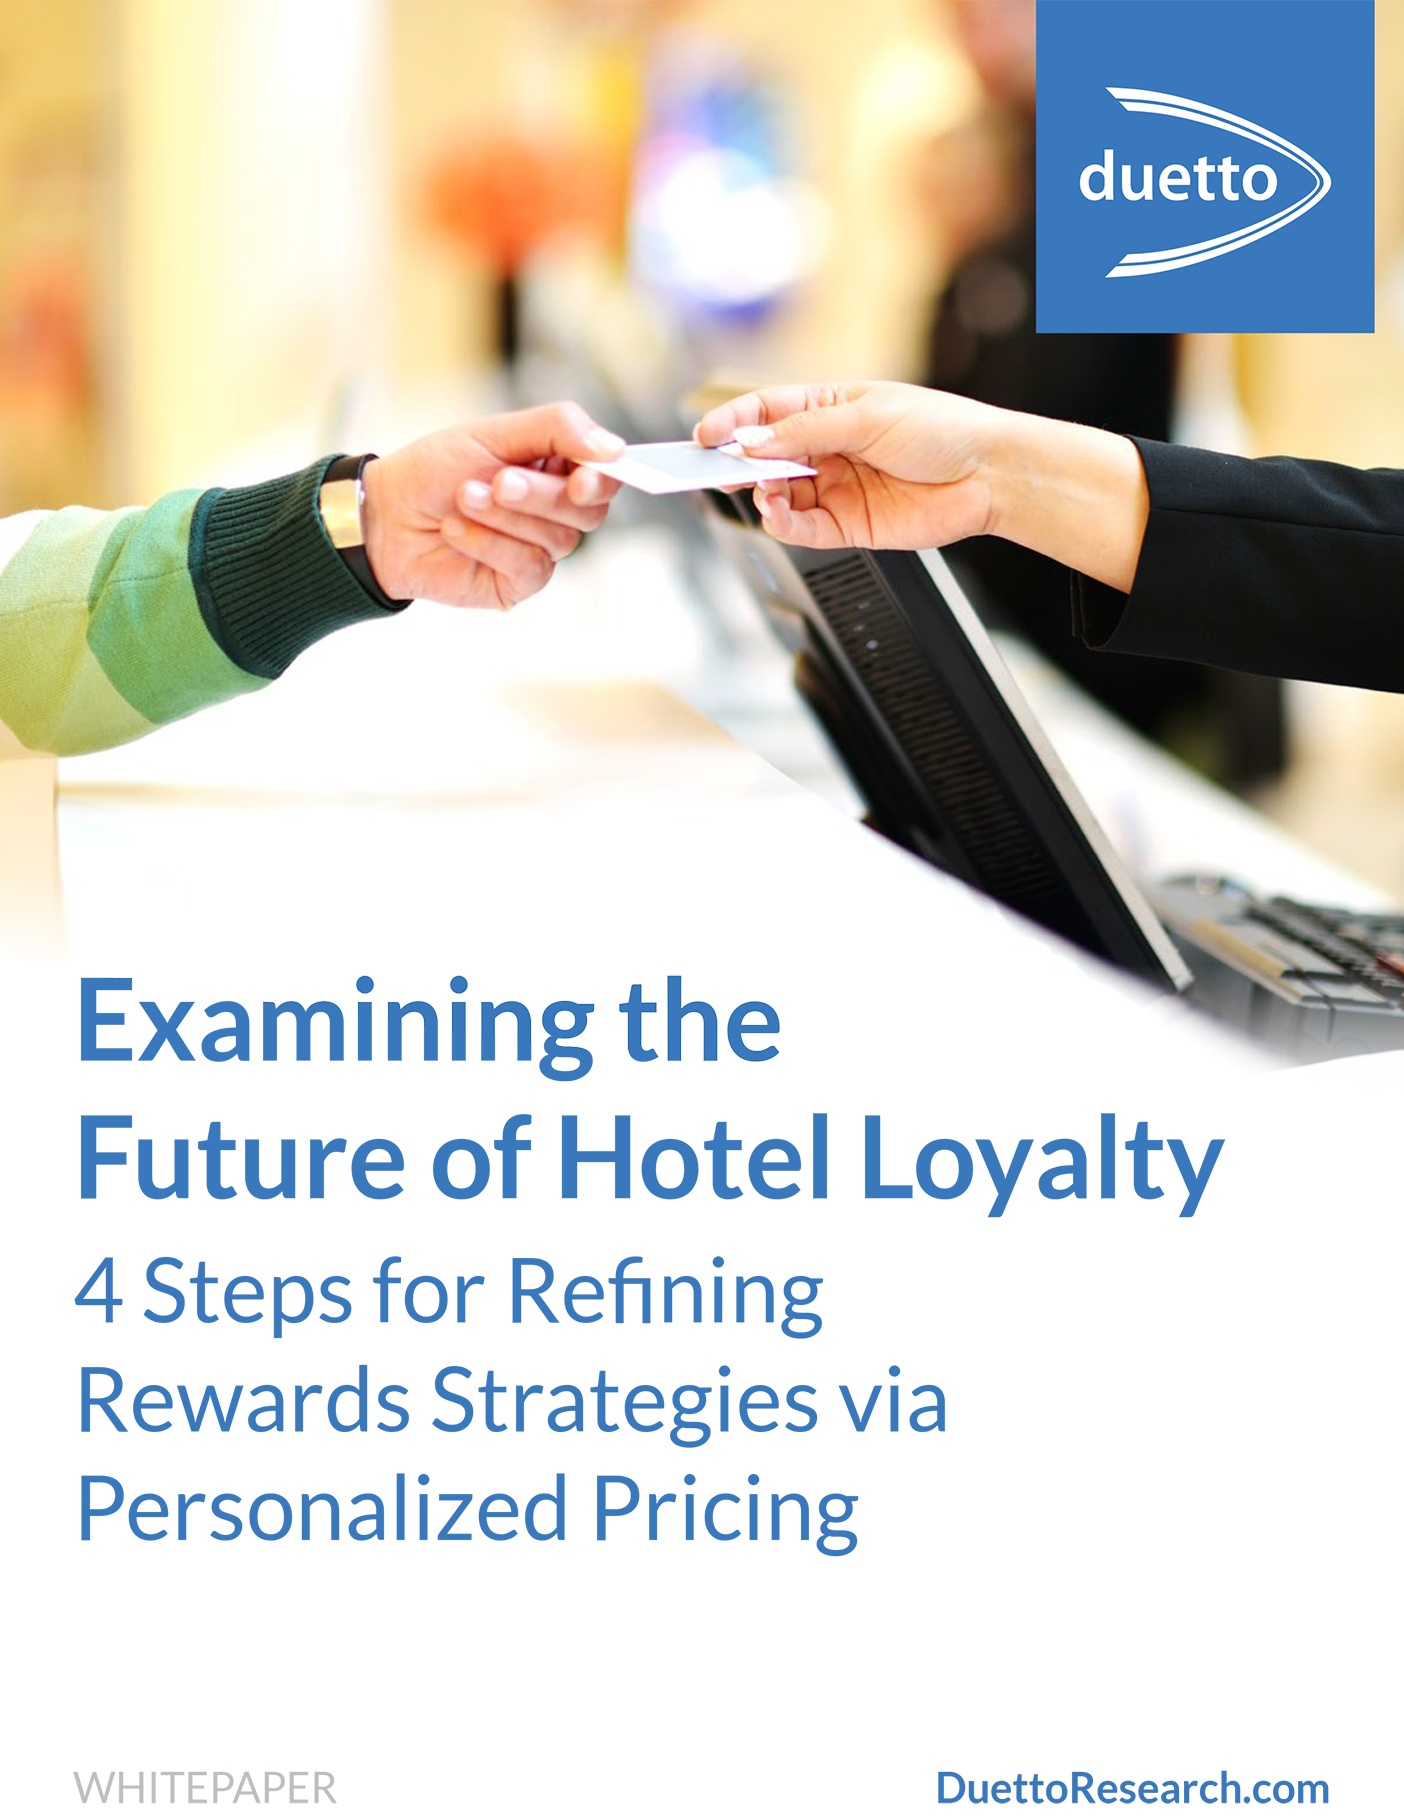 1_Examining the Future of Hotel Loyalty.jpg